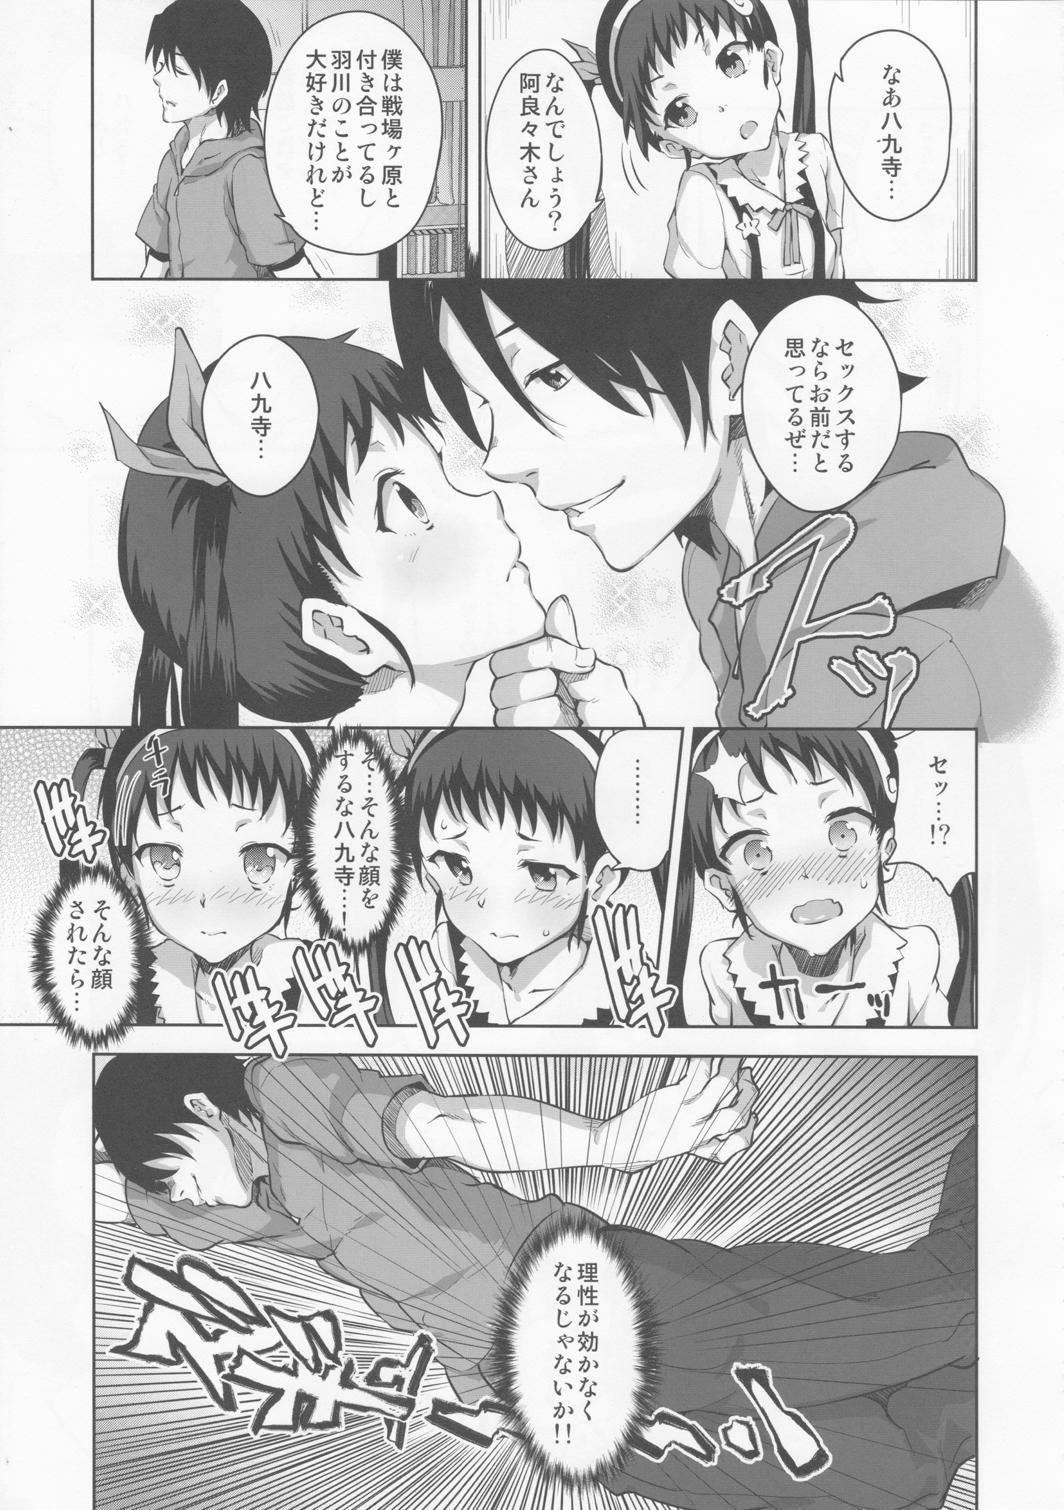 Namekuji Mayoigatari 5